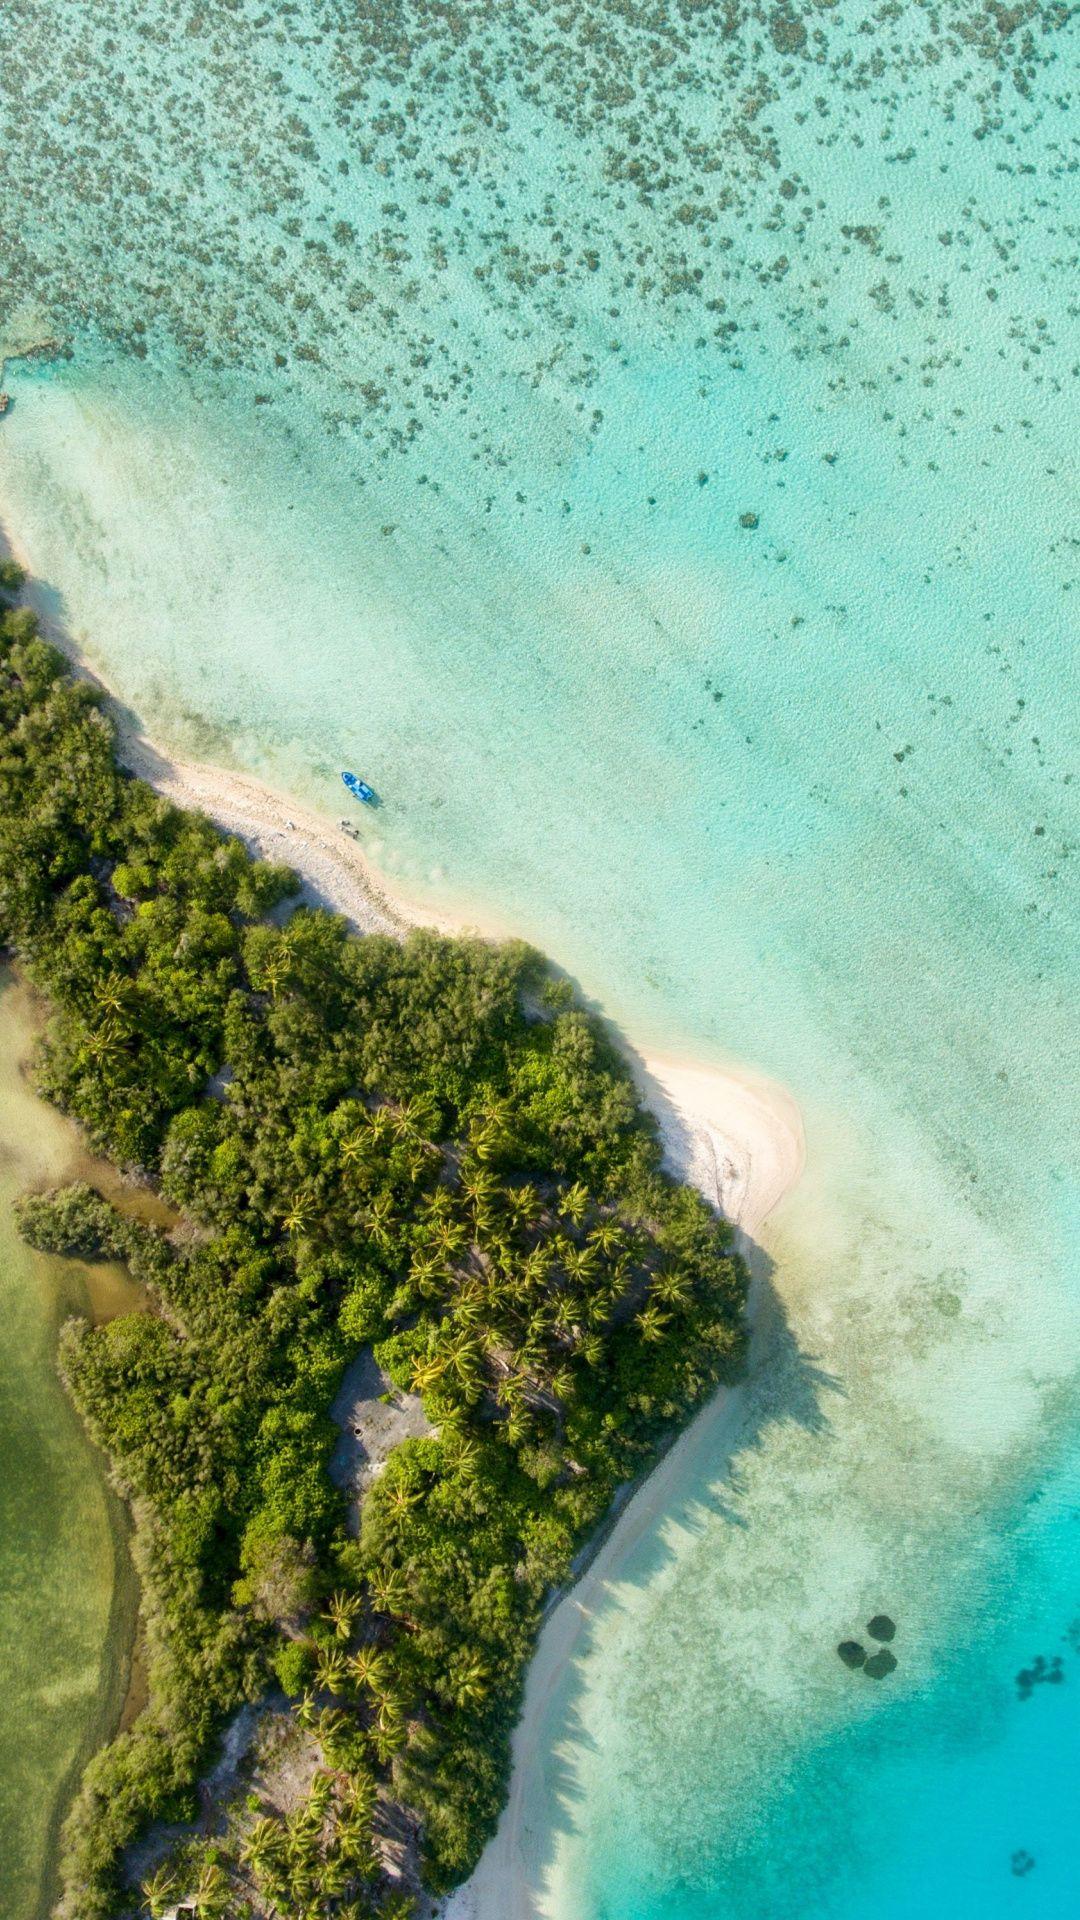 Coast Rocks Blue Green Sea Sea Waves Drone Shot Nature 1080x2160 Wallpaper Waves Wallpaper Scenery Wallpaper Landscape Wallpaper